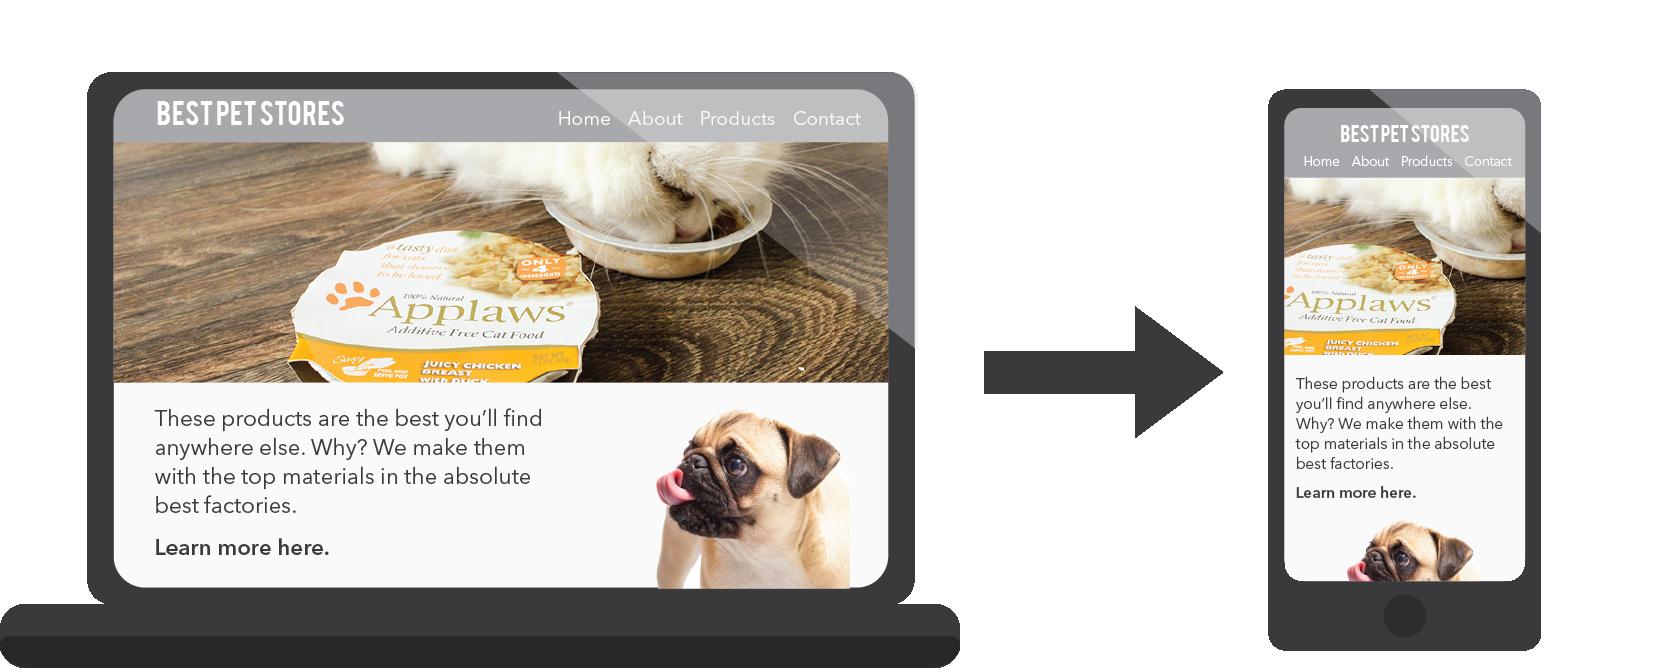 mobile-friendly-website-pet-business-marketing.png